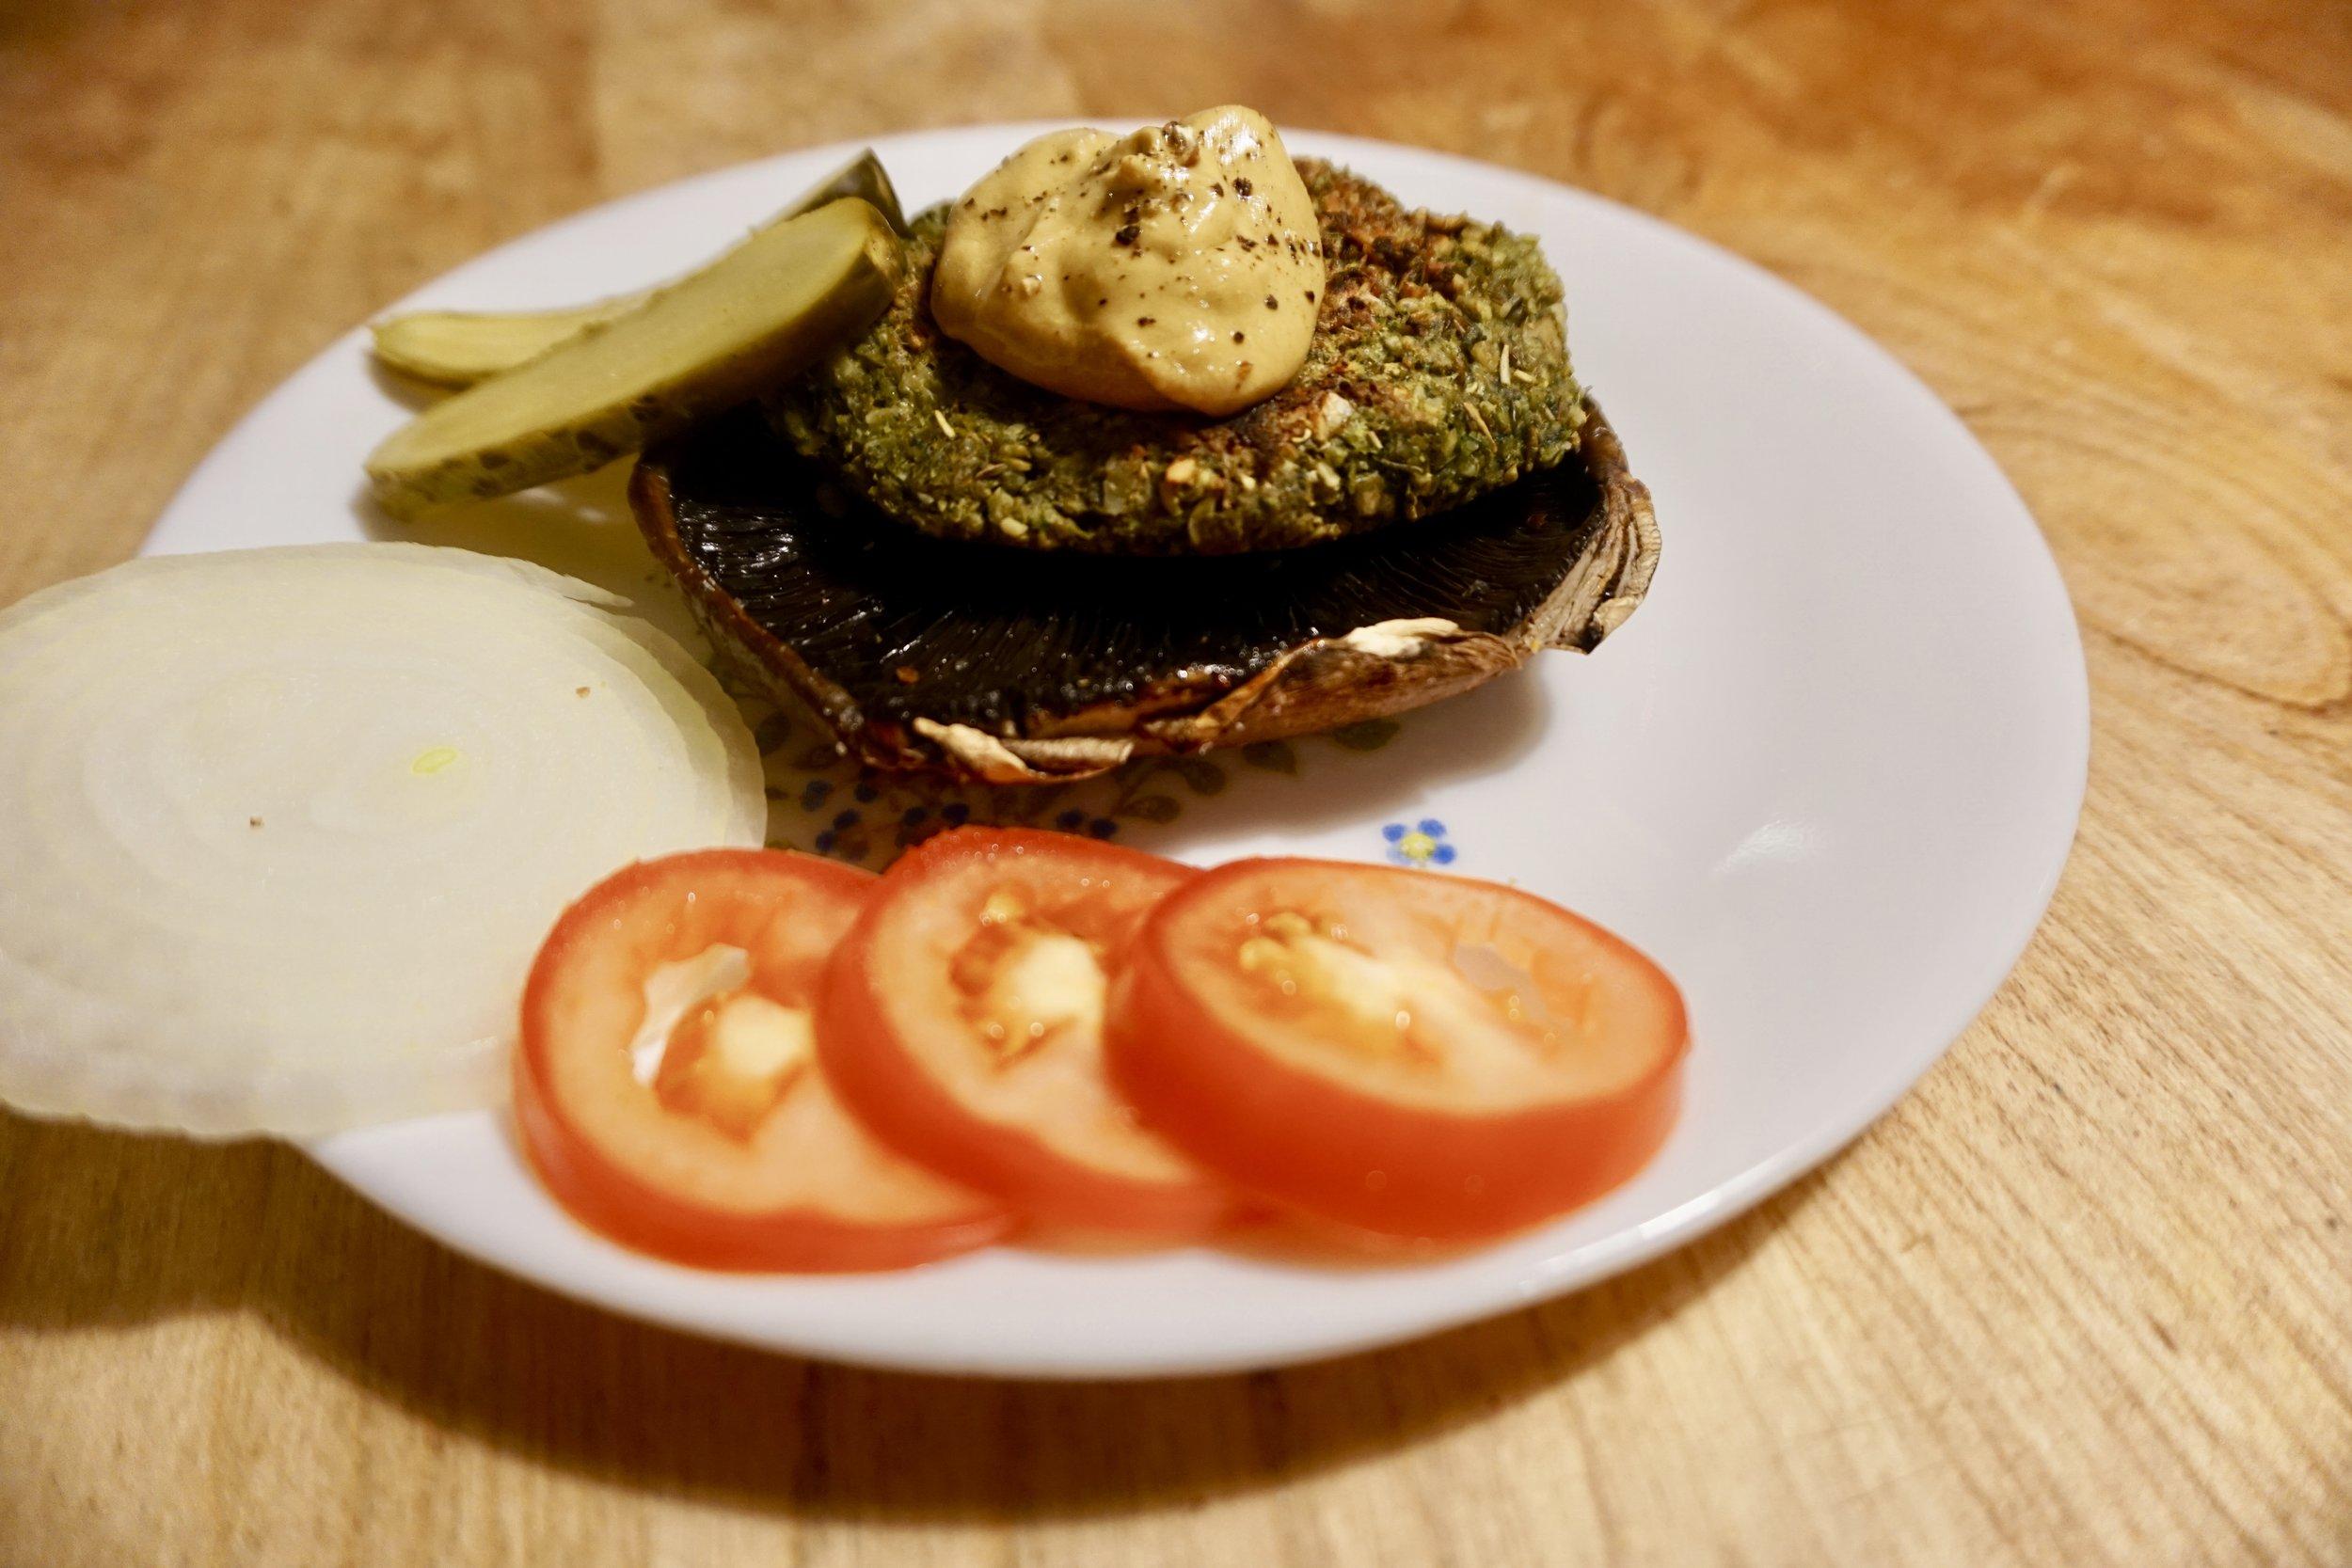 Lentil burger served on a portobello mushroom.